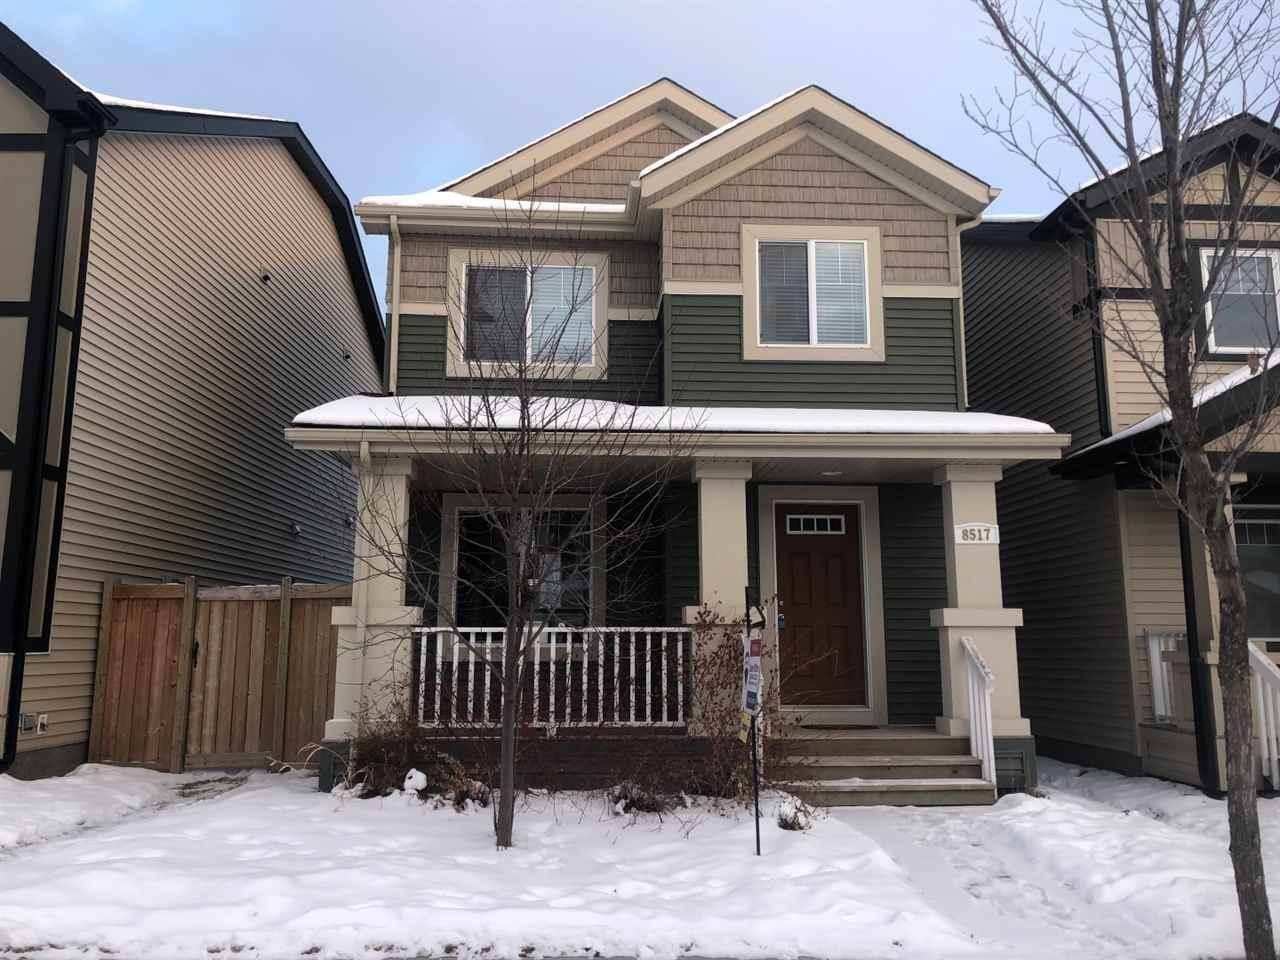 House for sale at 8517 Ellis Li Nw Edmonton Alberta - MLS: E4181531